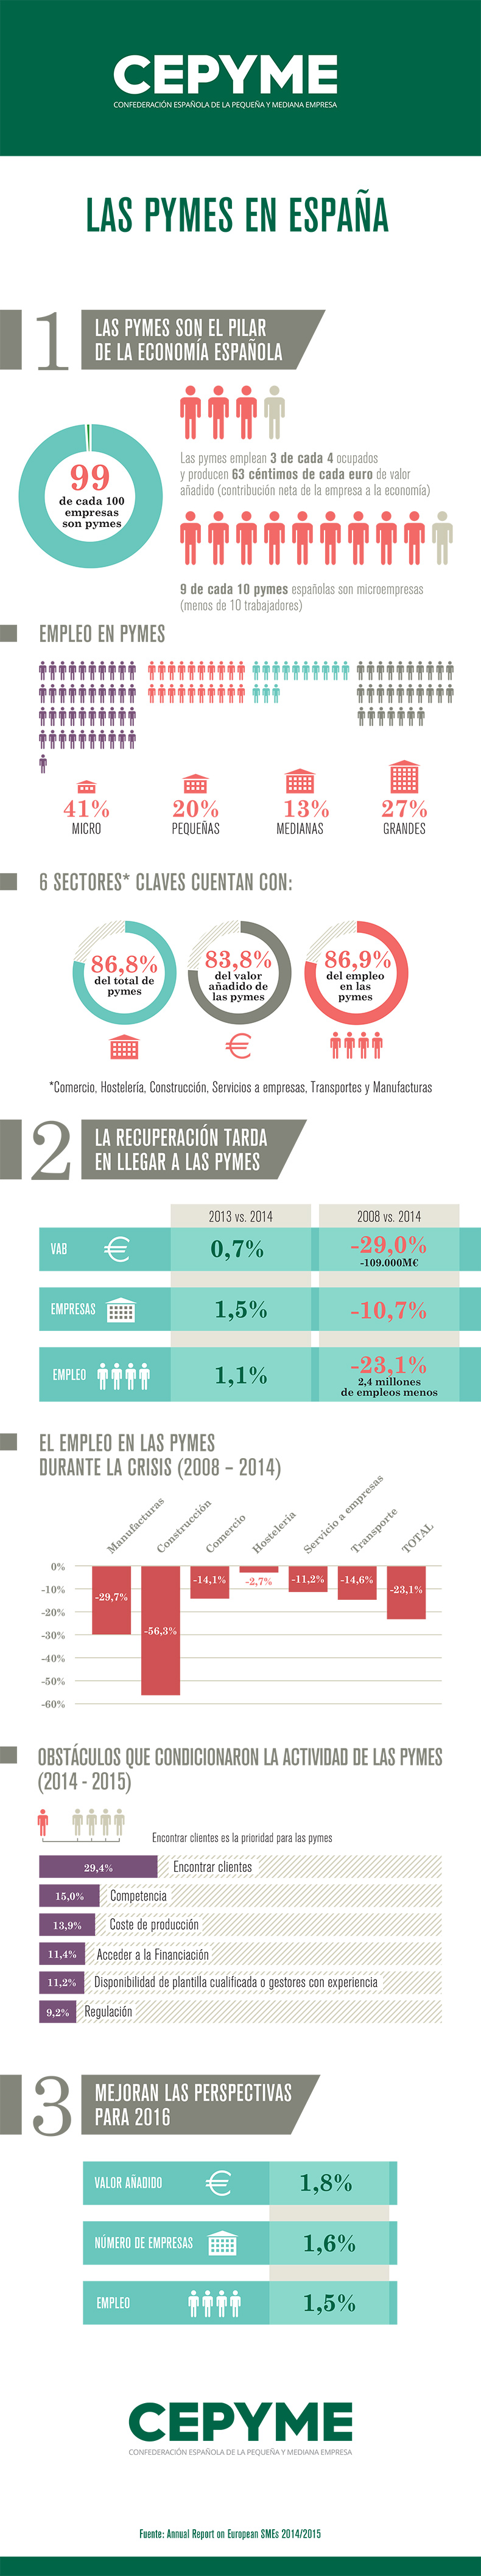 las-pymes-en-espana-infografia